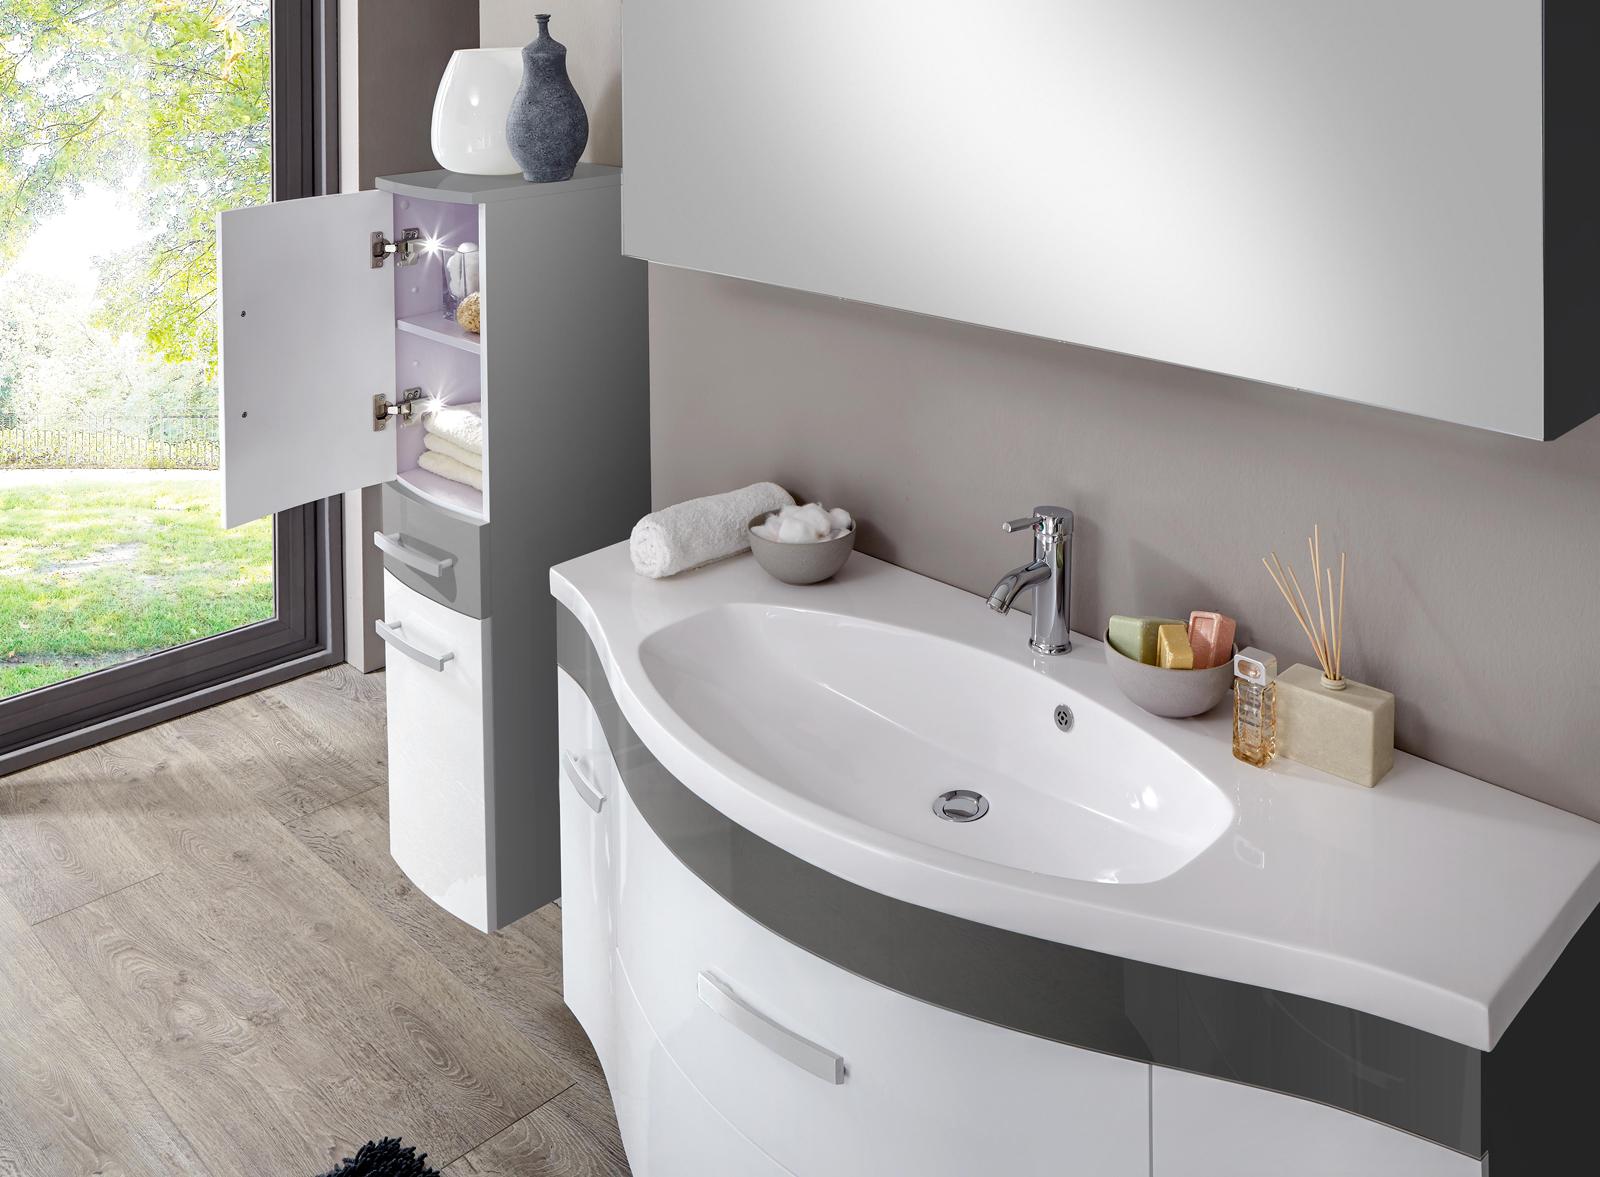 sam 3tlg badezimmer set hochglanz wei grau 130cm lugano deluxe auf lager. Black Bedroom Furniture Sets. Home Design Ideas